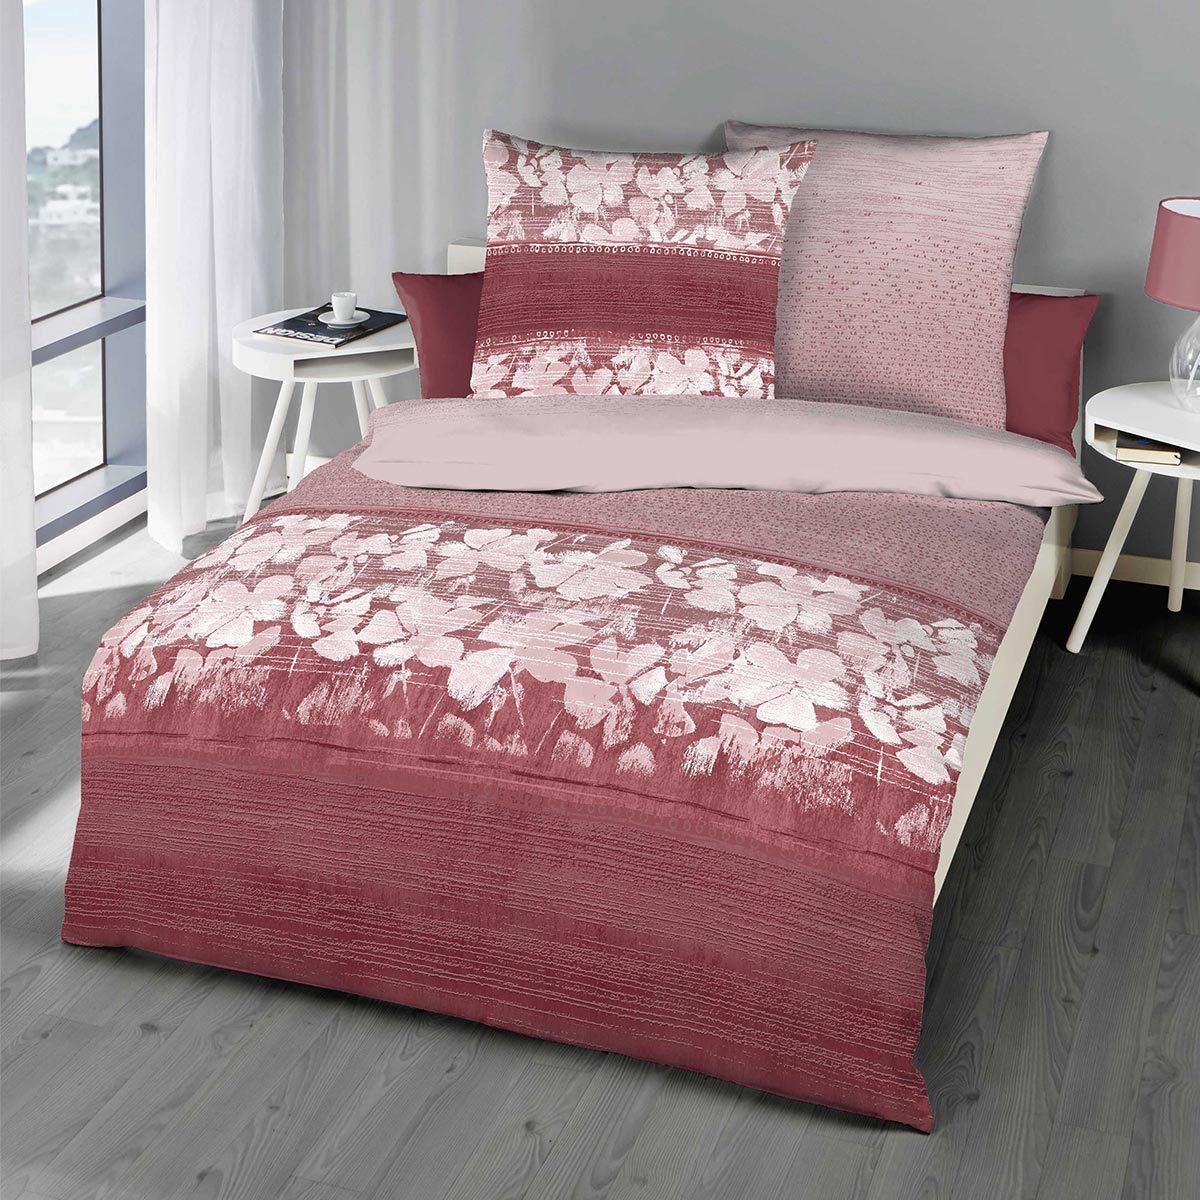 kaeppel biber bettw sche promise rubin g nstig online kaufen bei bettwaren shop. Black Bedroom Furniture Sets. Home Design Ideas